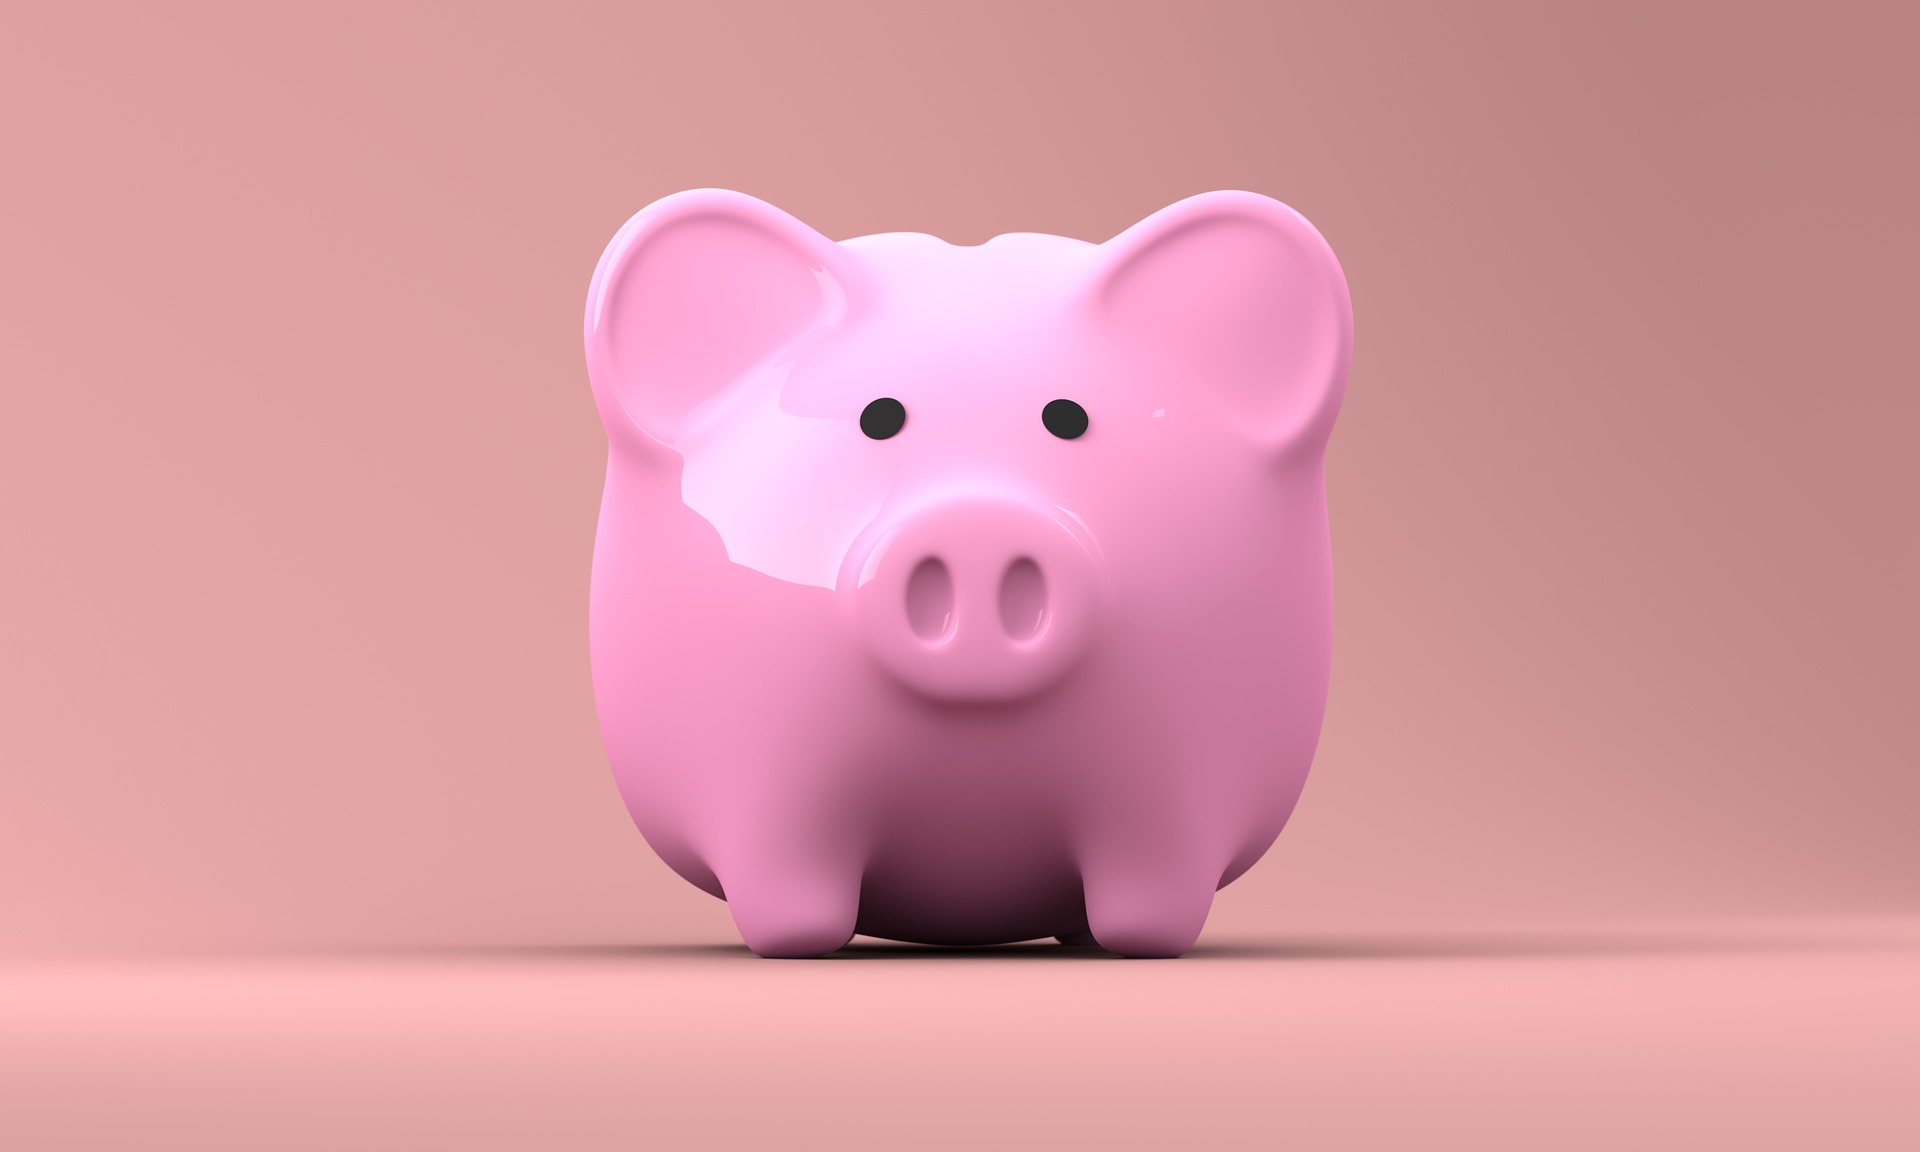 Kartkovyj budynok: Jak zaklady harčuvannja opanovujuť bezgotivkovi plateži